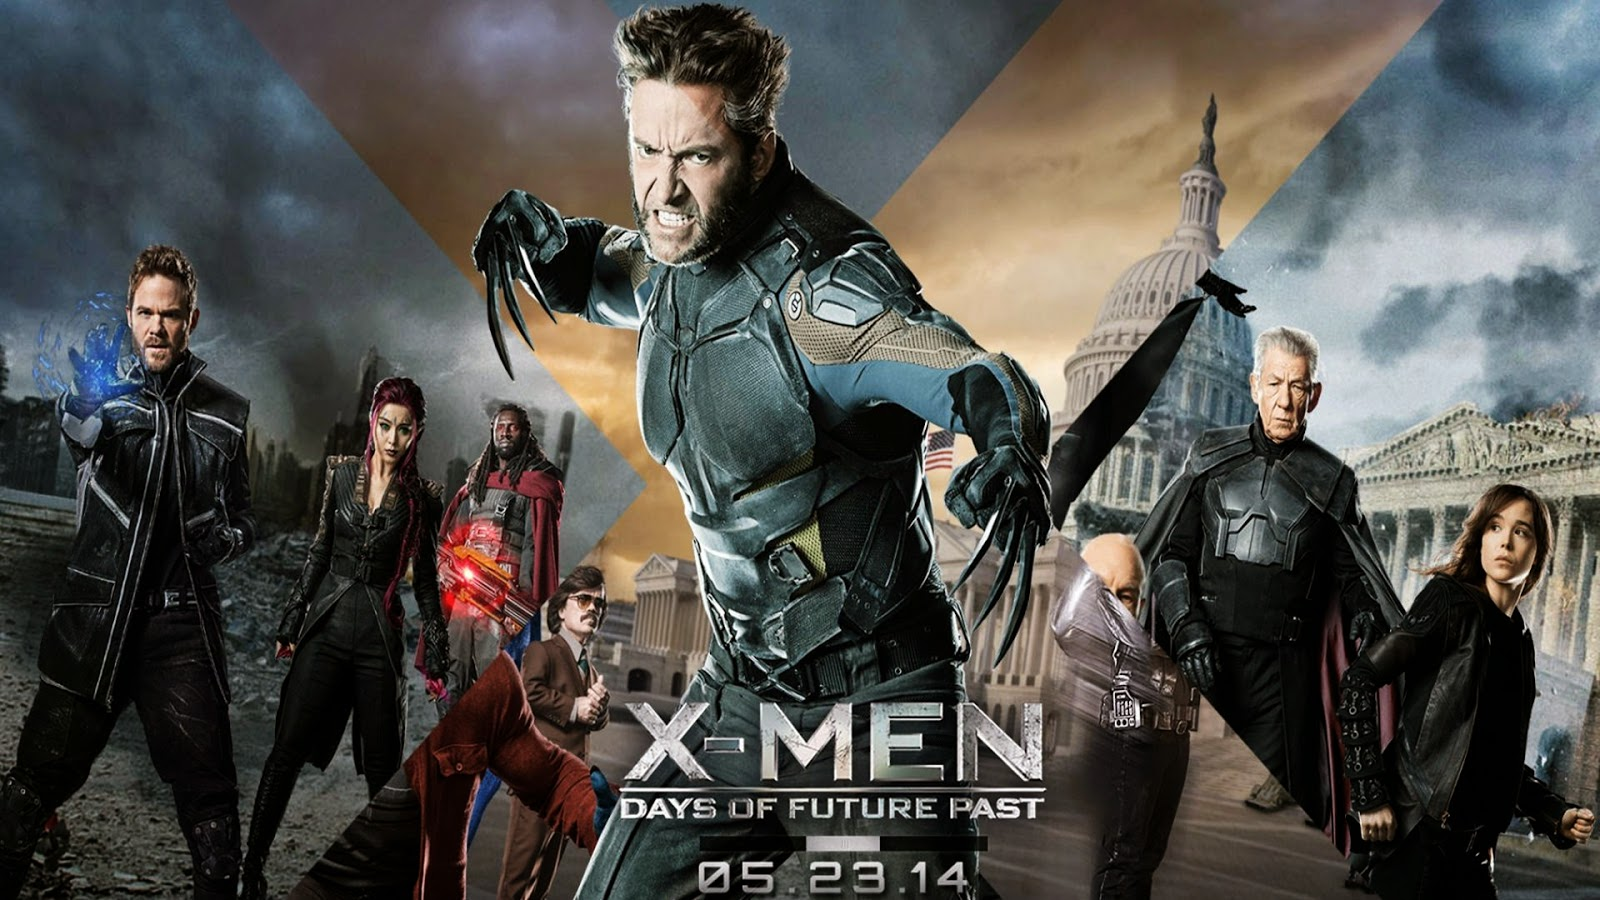 X Men Days Of Future Past Wallpaper: The Future Machine: TEN COOLEST MUTANTS FROM THE X-MEN